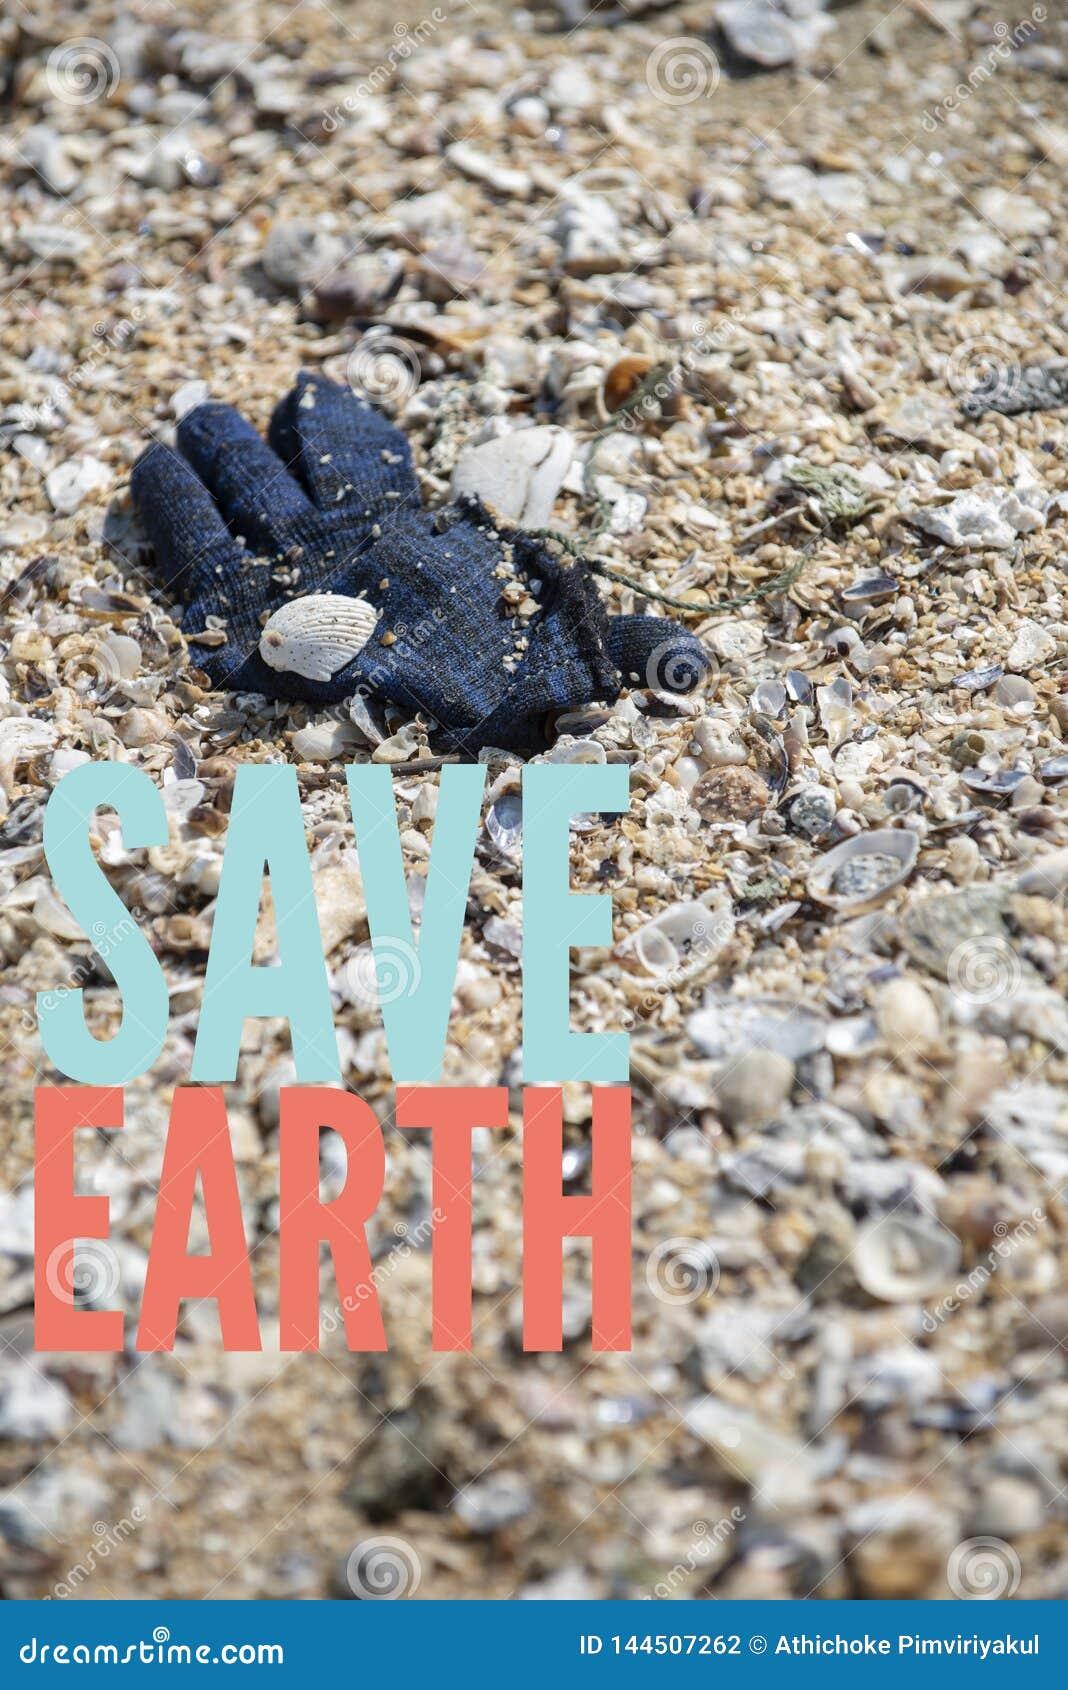 A deep blue winter yarn glove found trashed on the beach. Save Earth please!